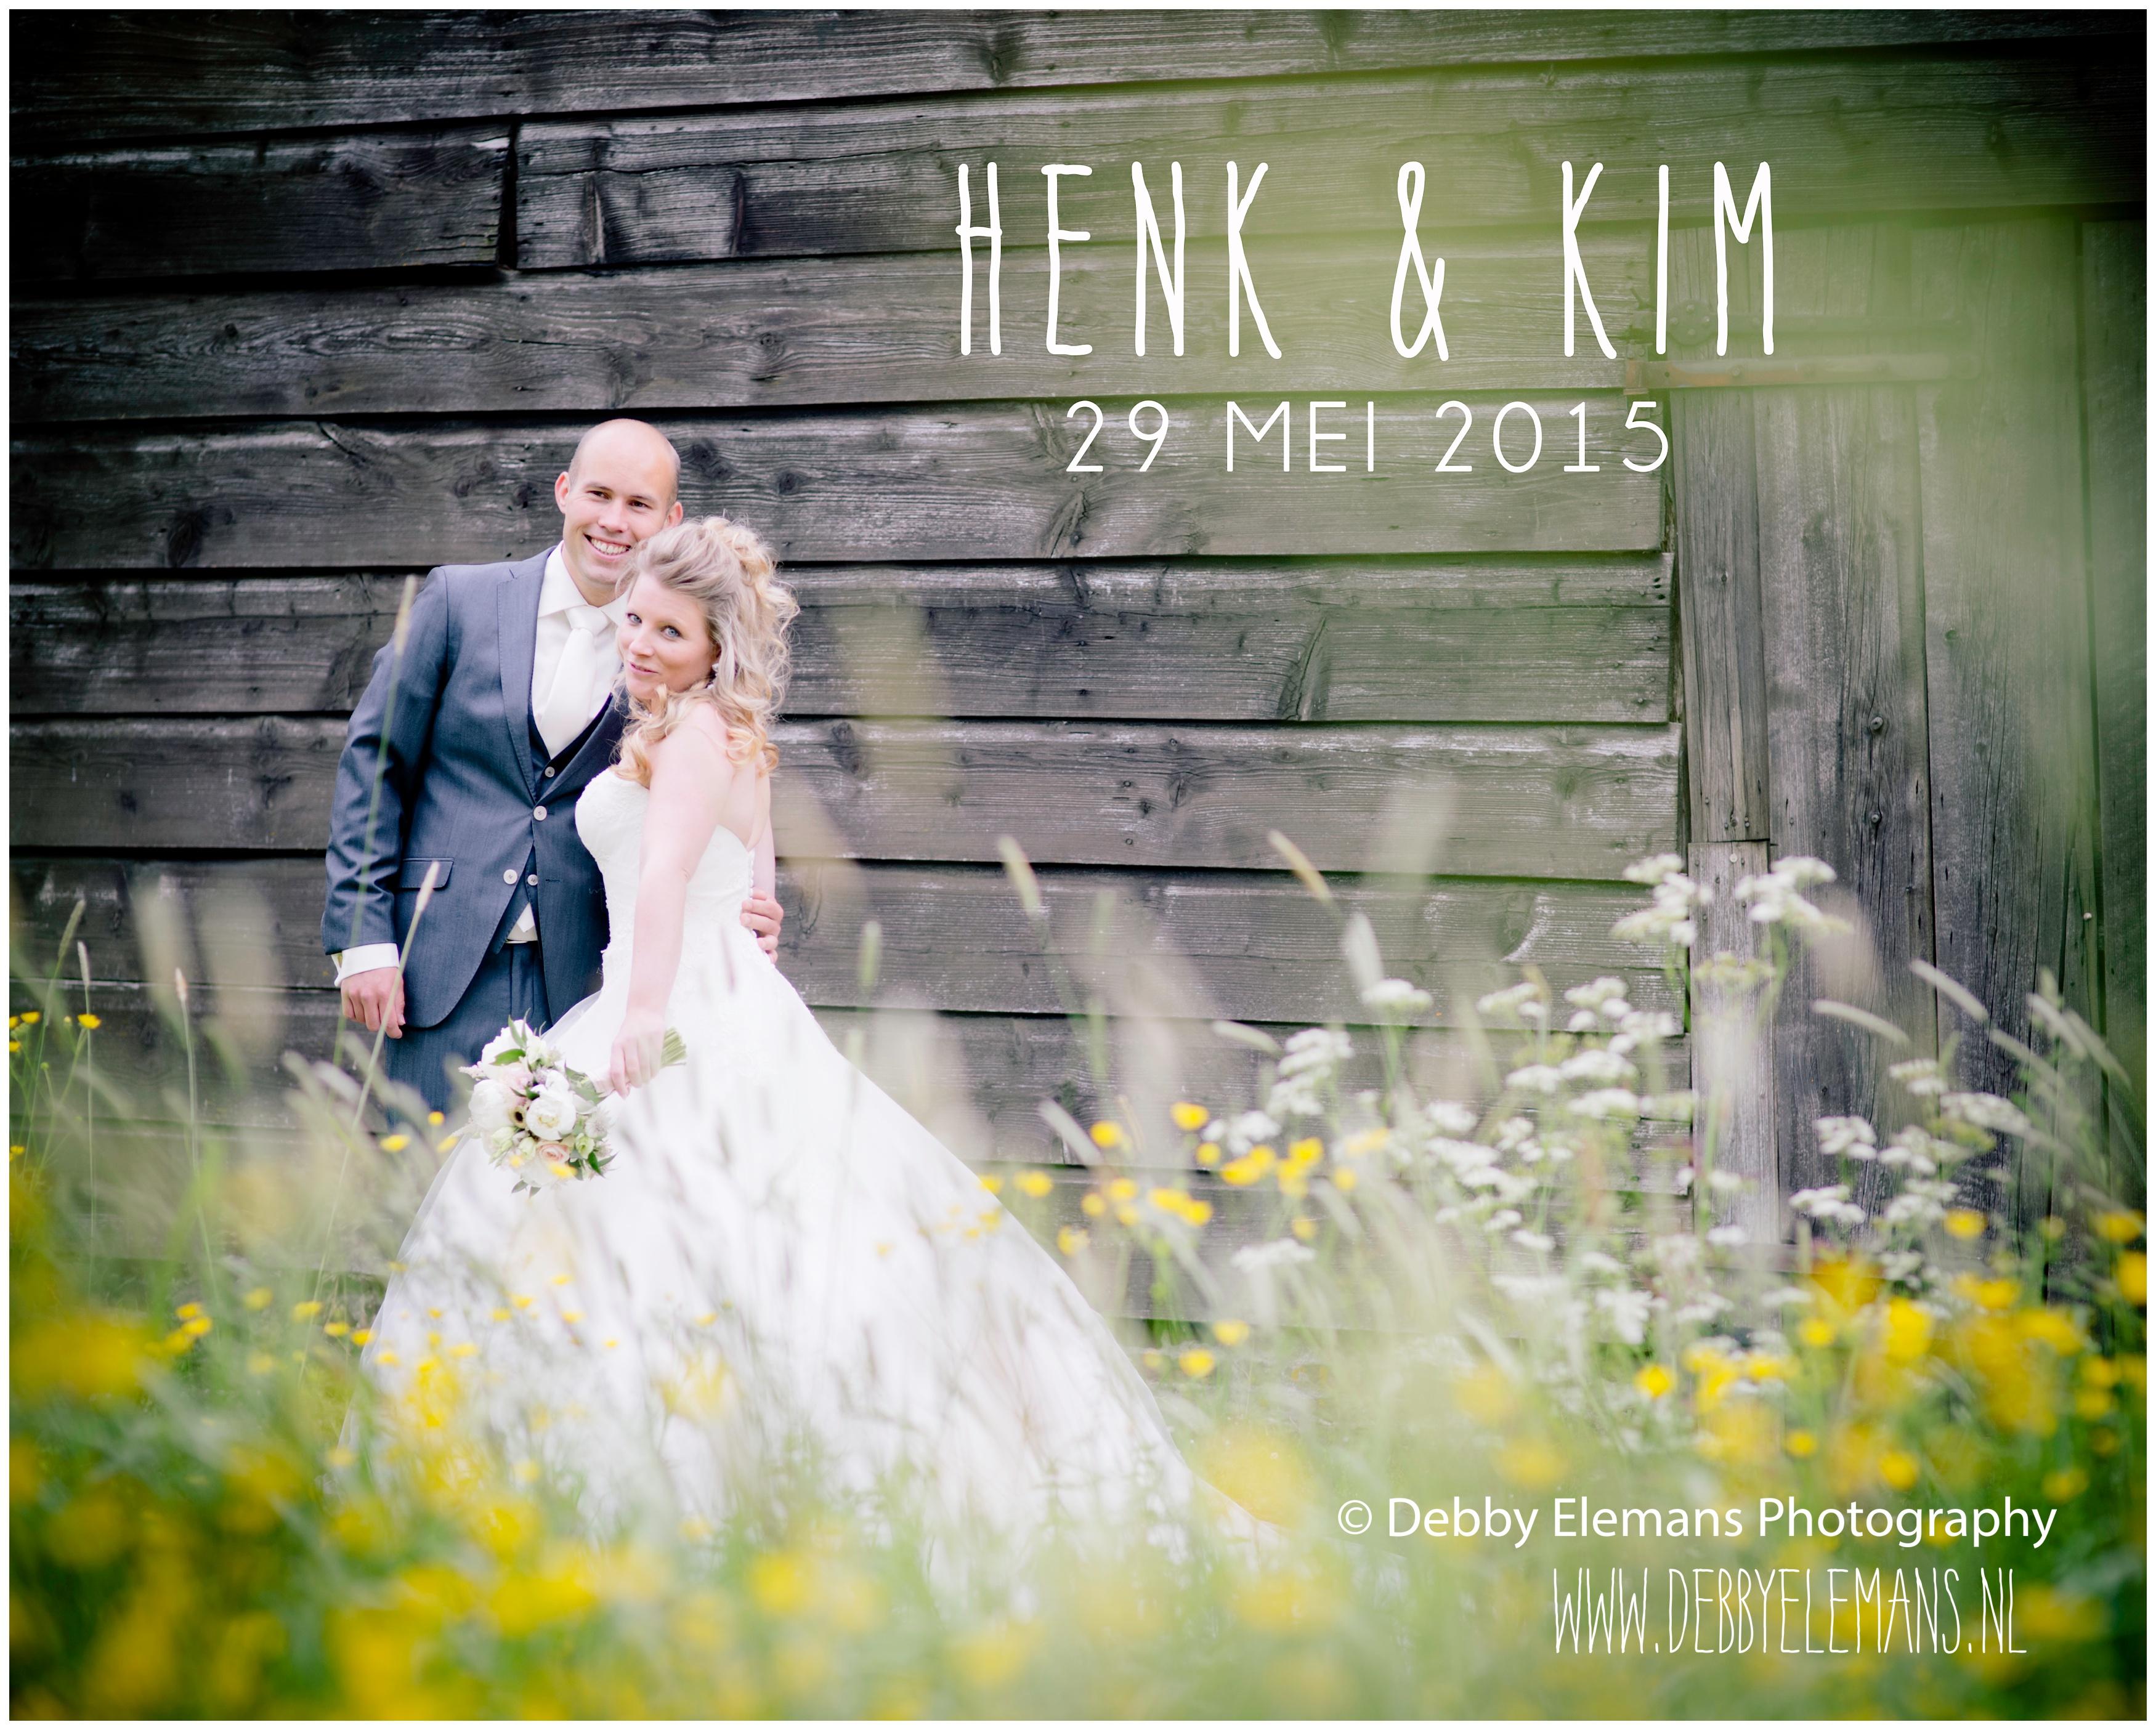 Bruidspaar Henk & Kim Walpot (29-05-2015).jpeg